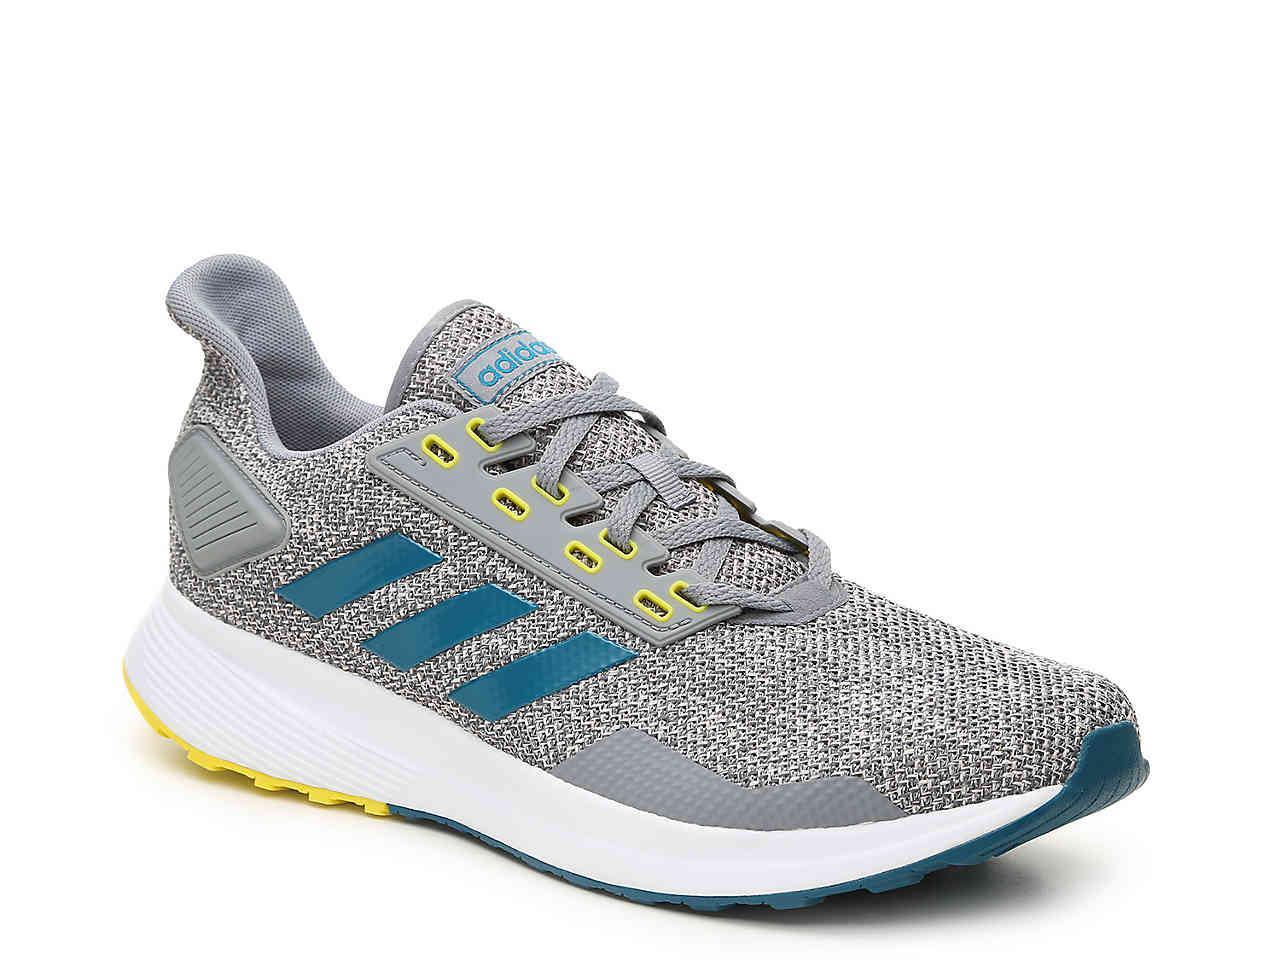 8a17ad30a05 Lyst - adidas Duramo 9 Lightweight Running Shoe in Gray for Men